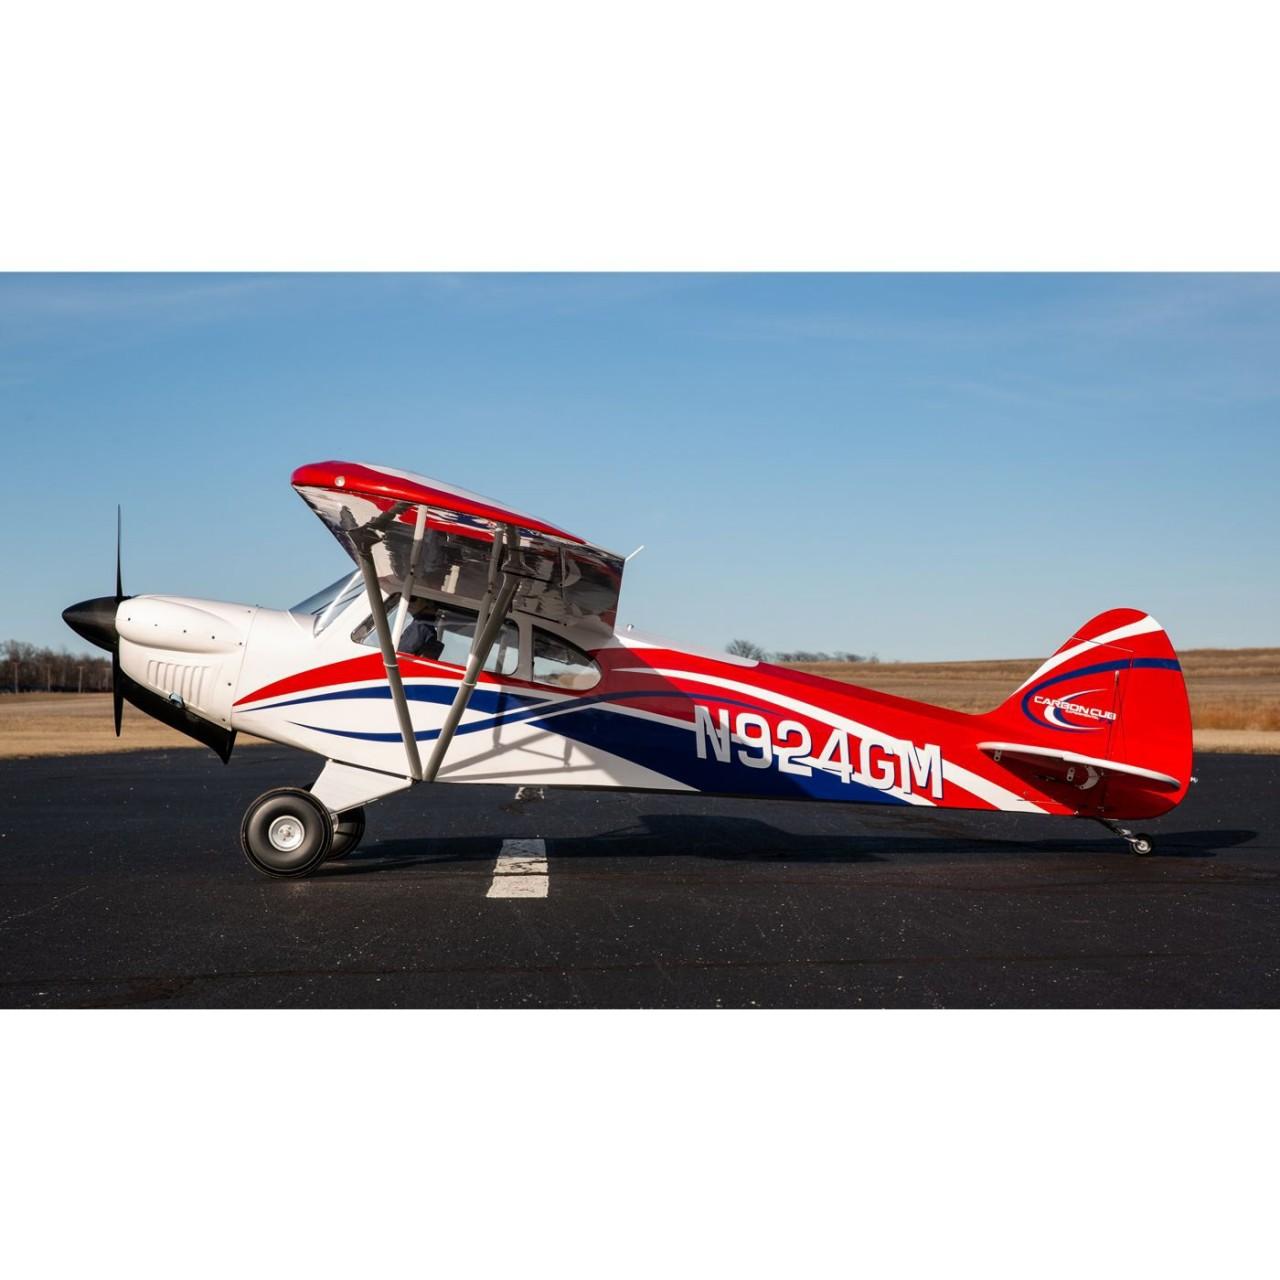 Hangar 9 CubCrafters Carbon Cub FX-3 100-200cc ARF with DLE222 222cc HAN5280CDLE222